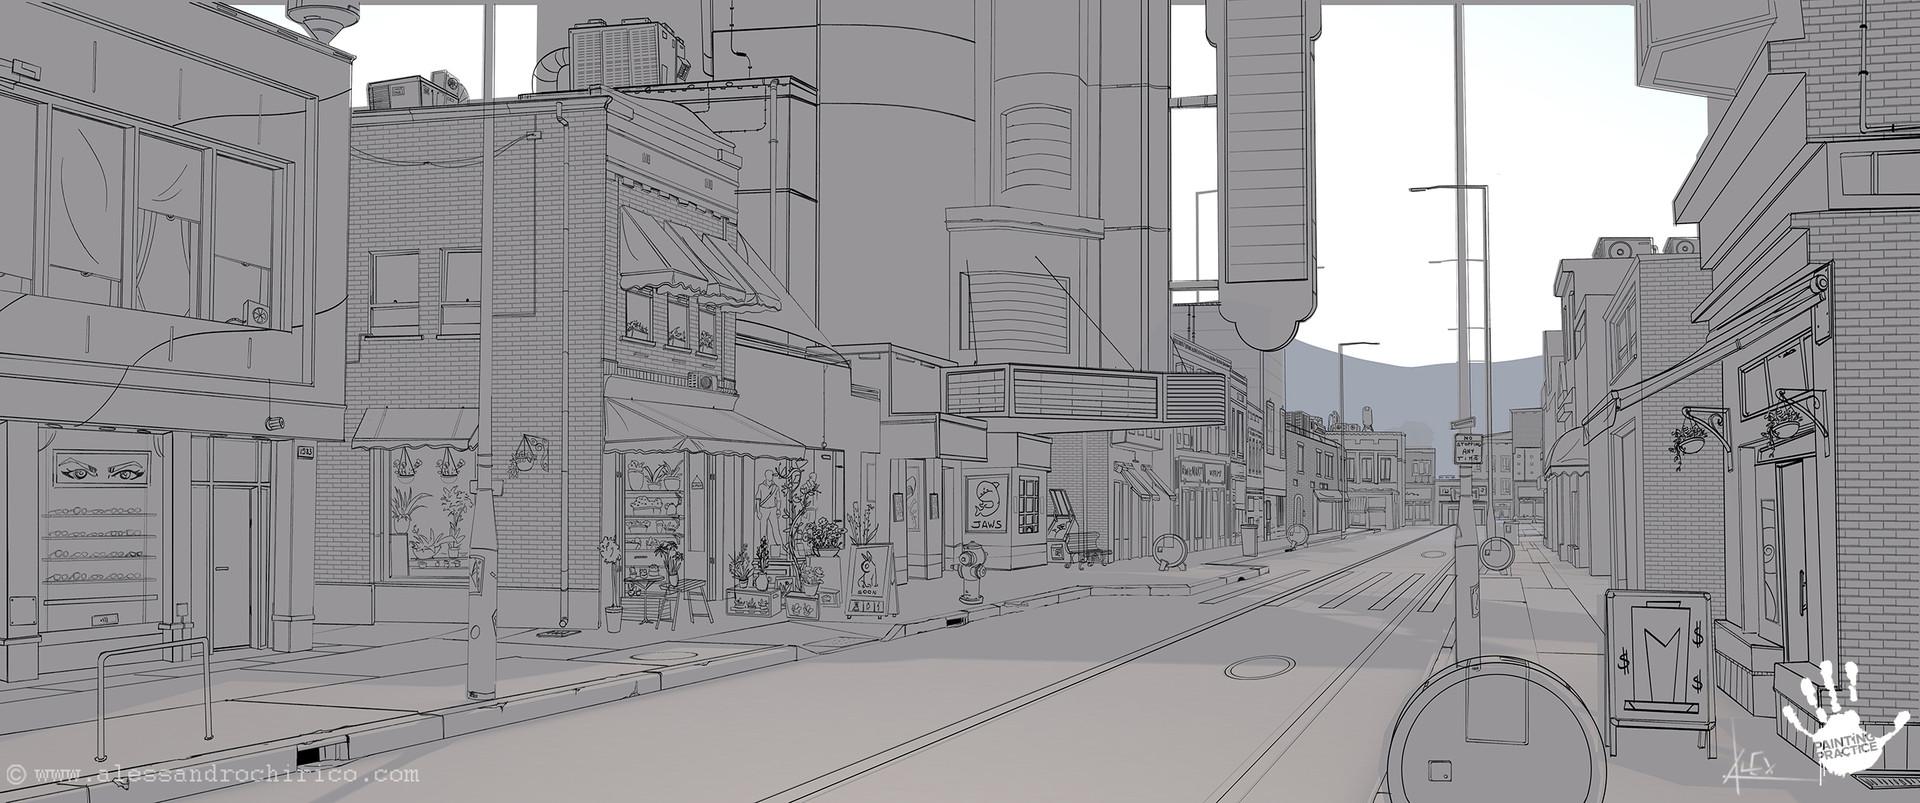 Alessandro chirico 01 street layout alessandro chirico